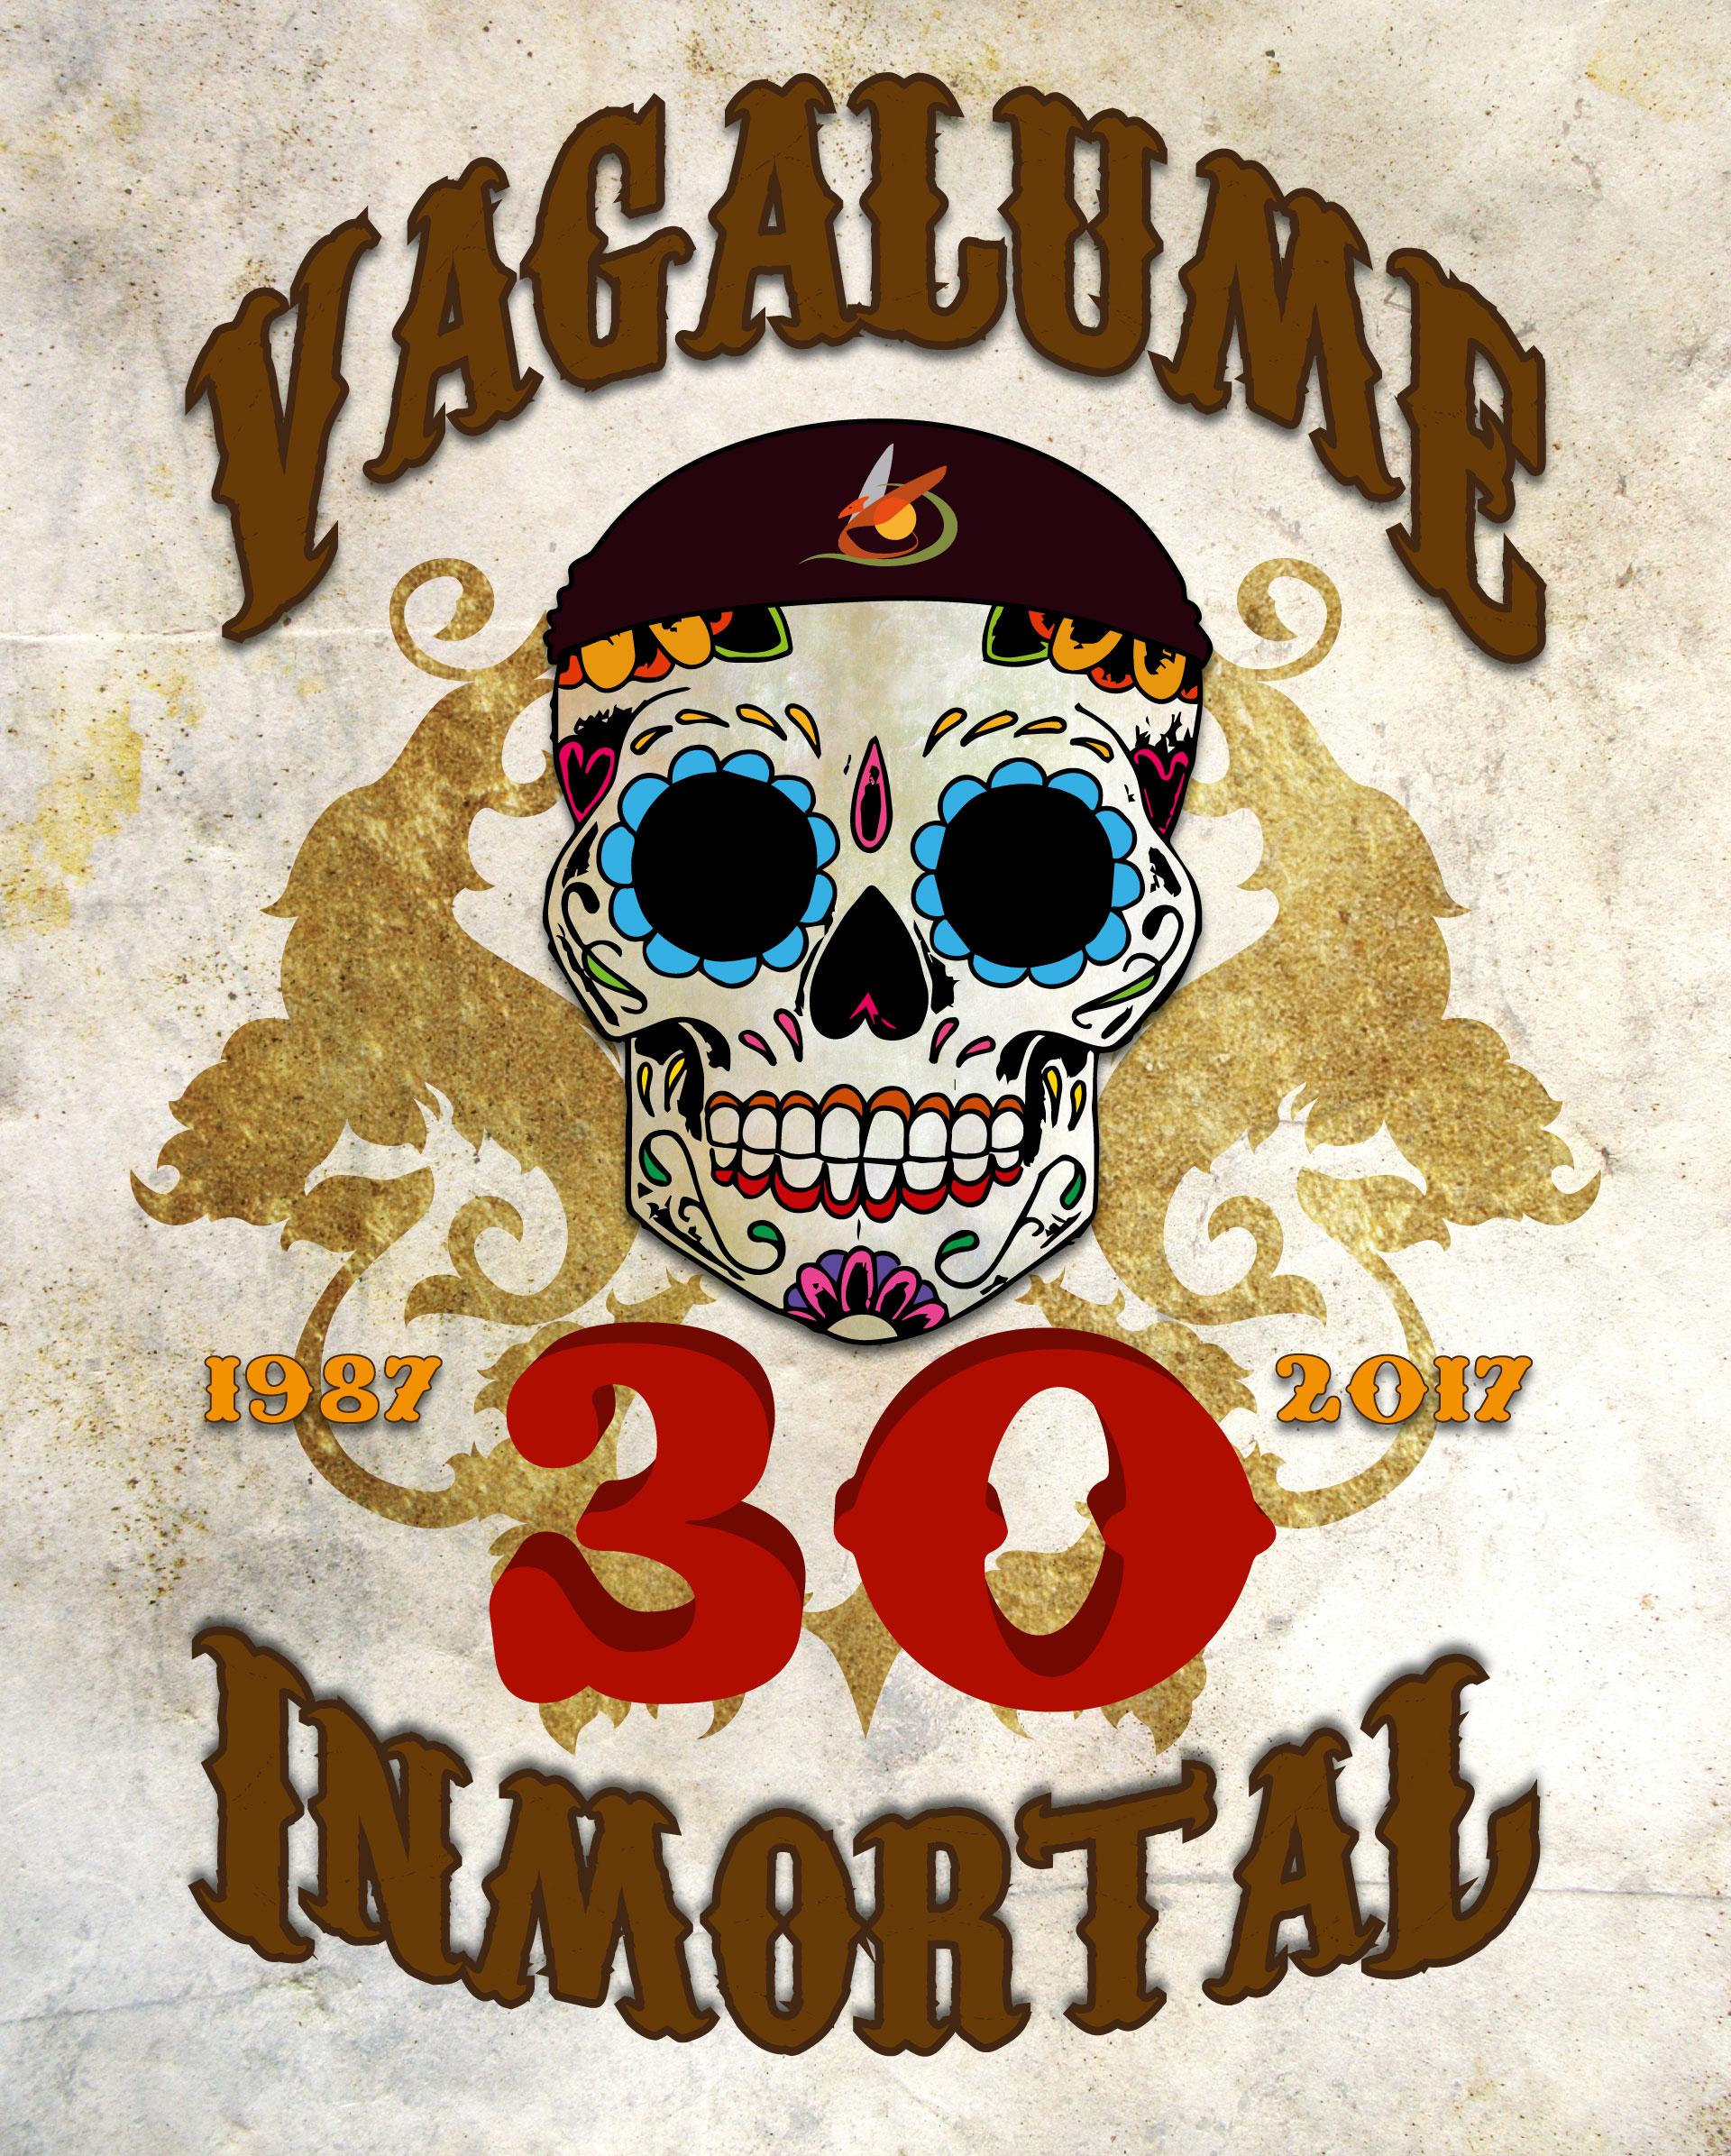 vagalume inmortal